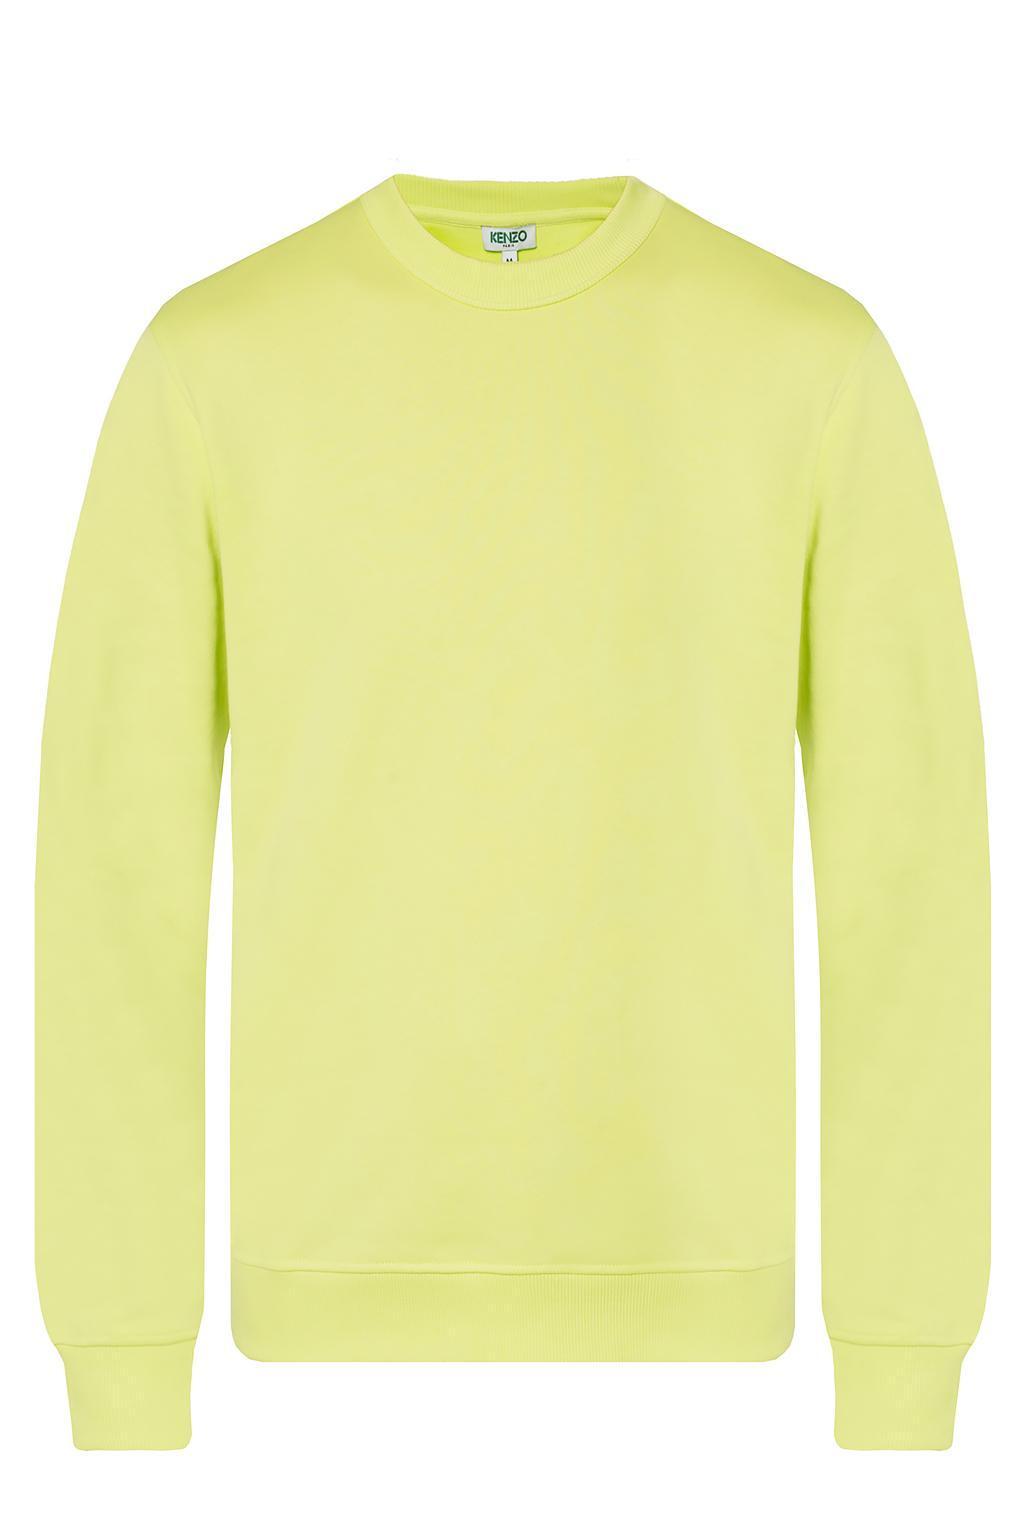 5eb13a14 KENZO - Yellow Logo-printed Sweatshirt for Men - Lyst. View fullscreen